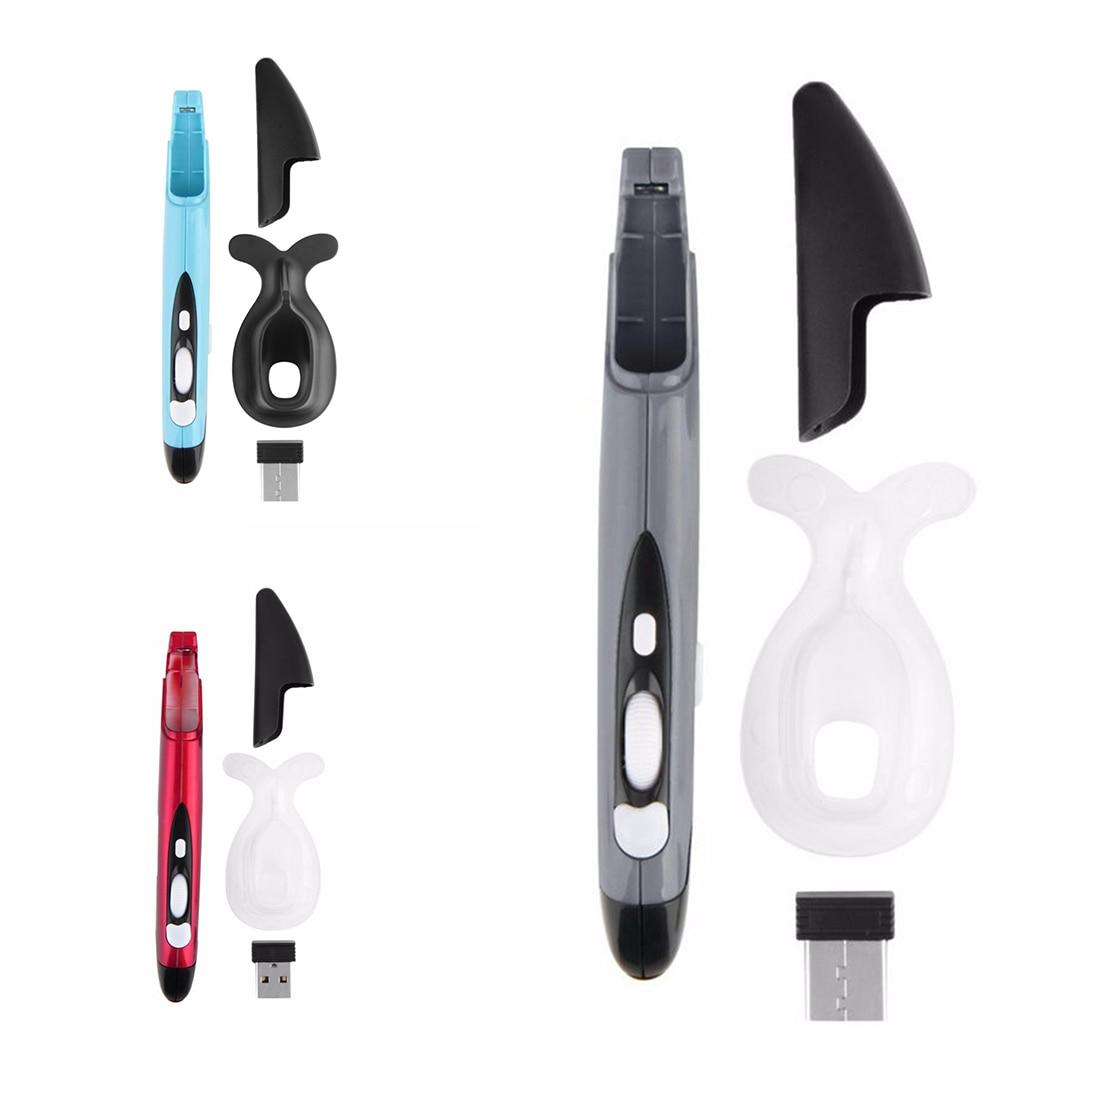 NOYOKERE Mini 2.4GHz USB Wireless Mouse Optical Pen Air Mouse Adjustable 500 / 1000DPI for Laptops Desktops Computer Peripherals